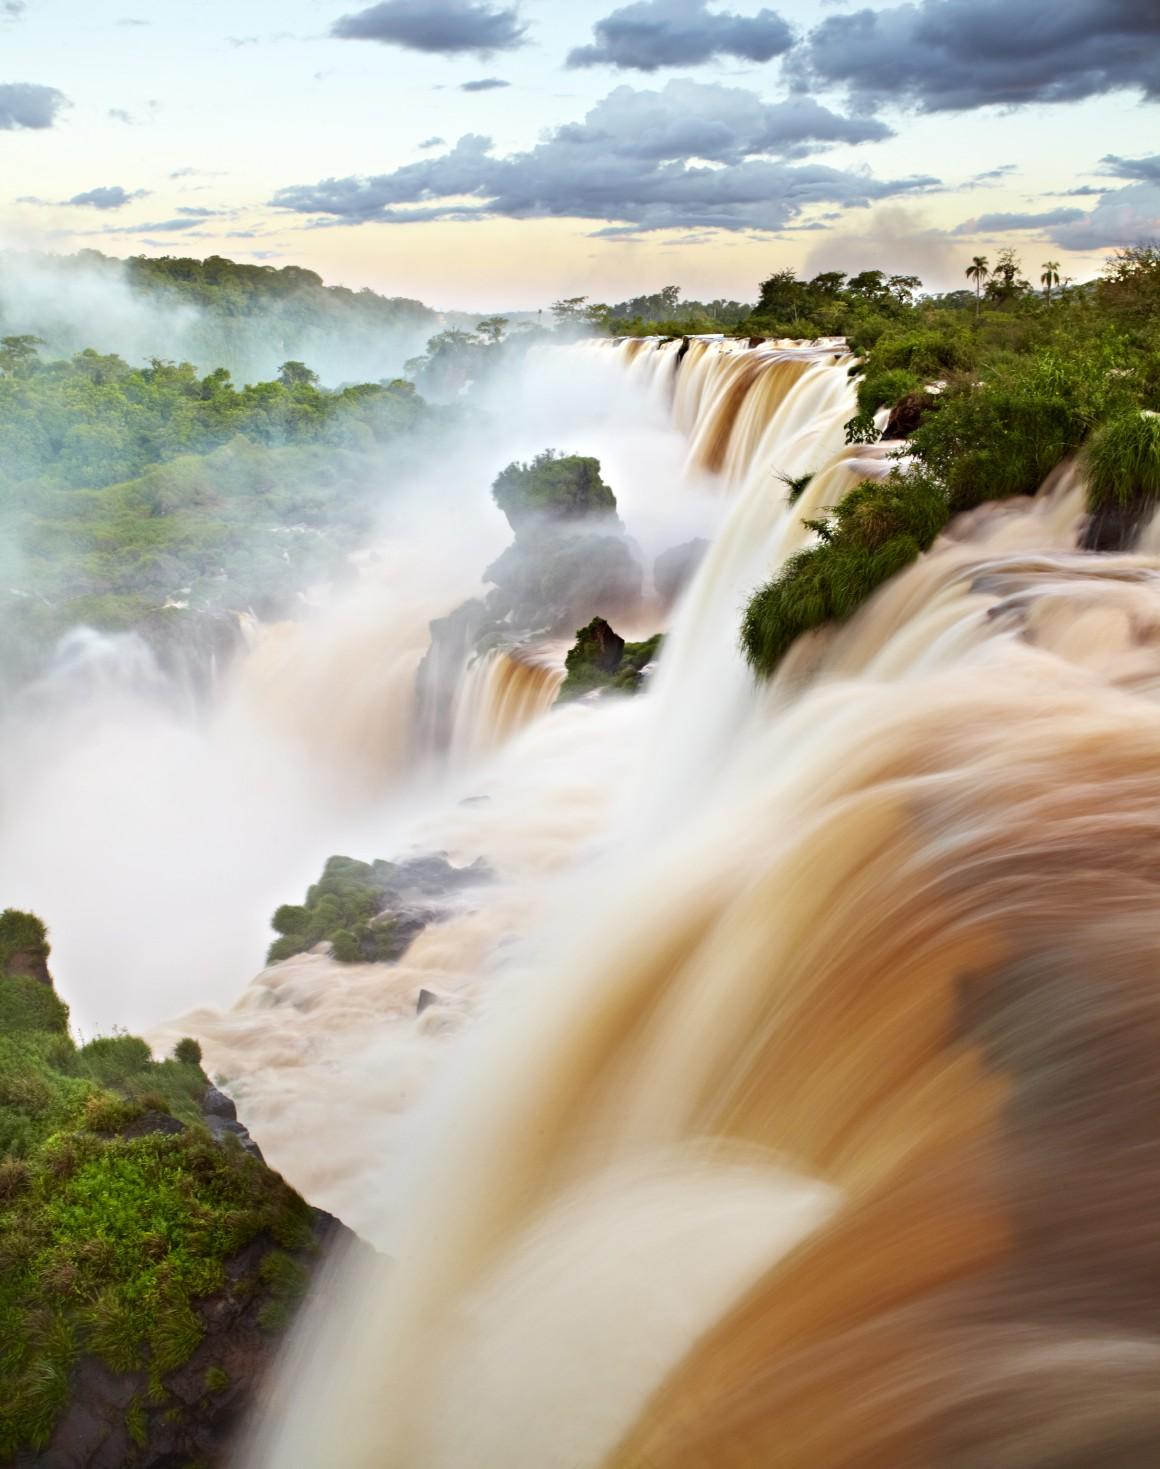 ARGENTINA. Cataratas de Iguaçu